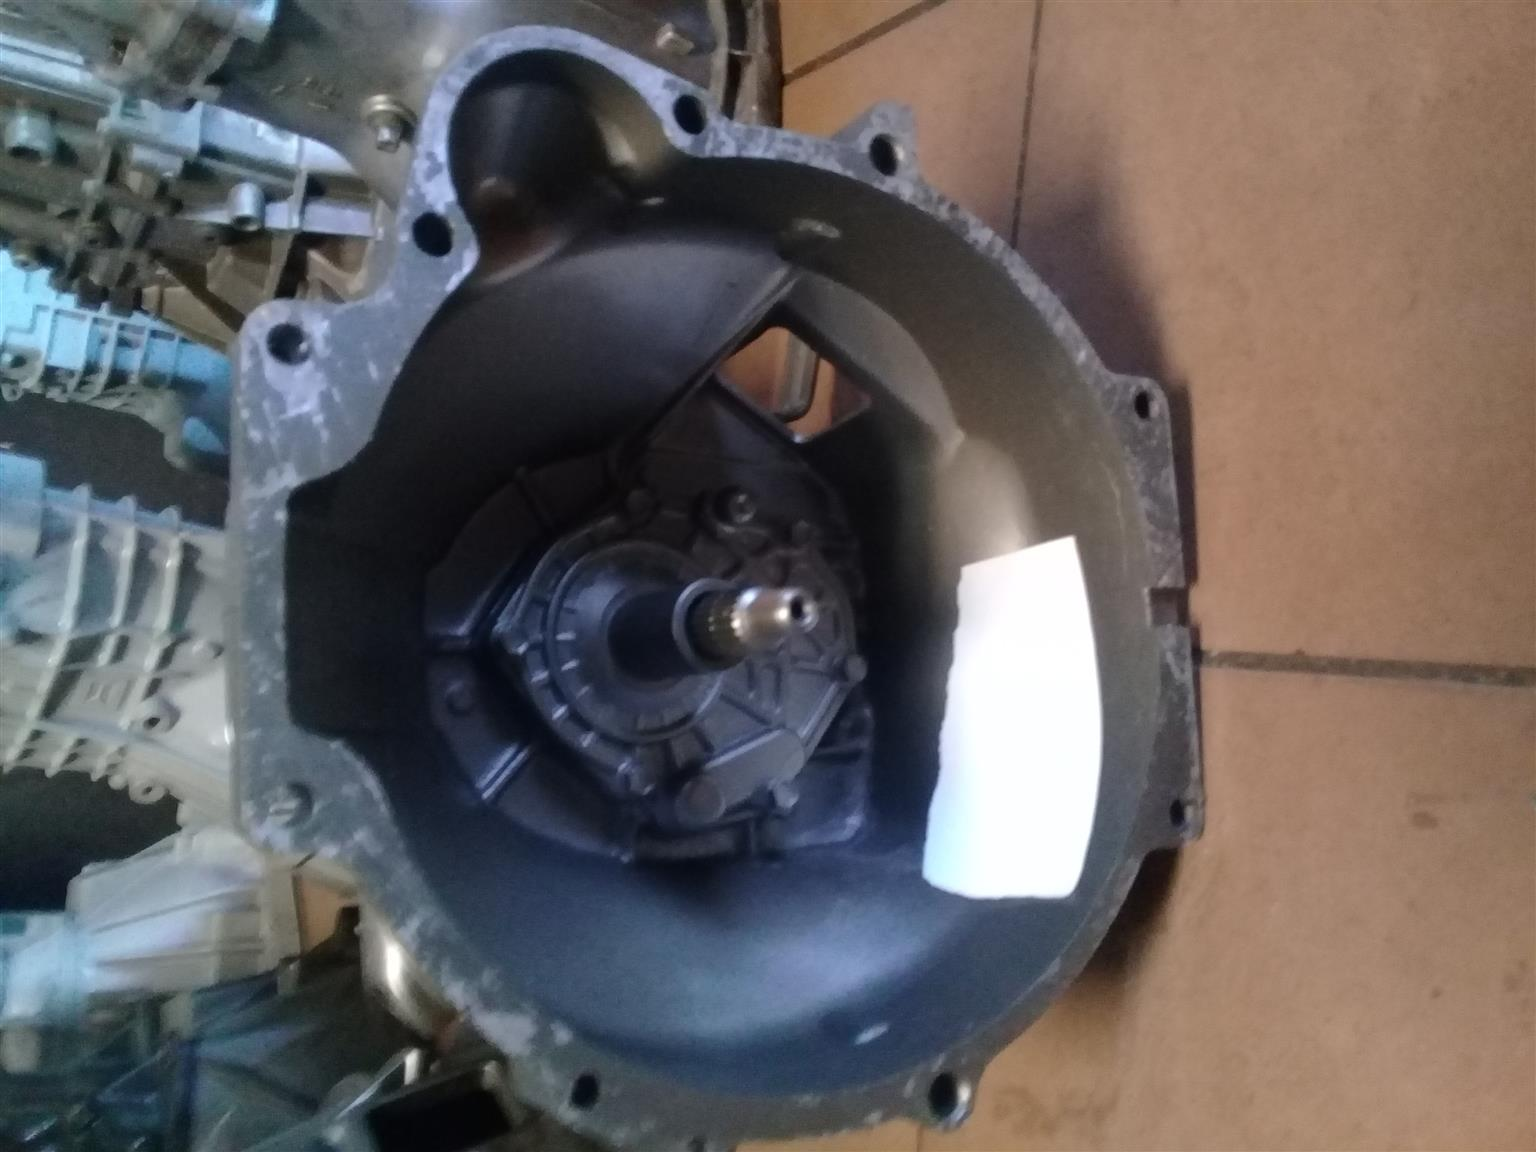 Hyundai H100 2x4 Recon gearbox